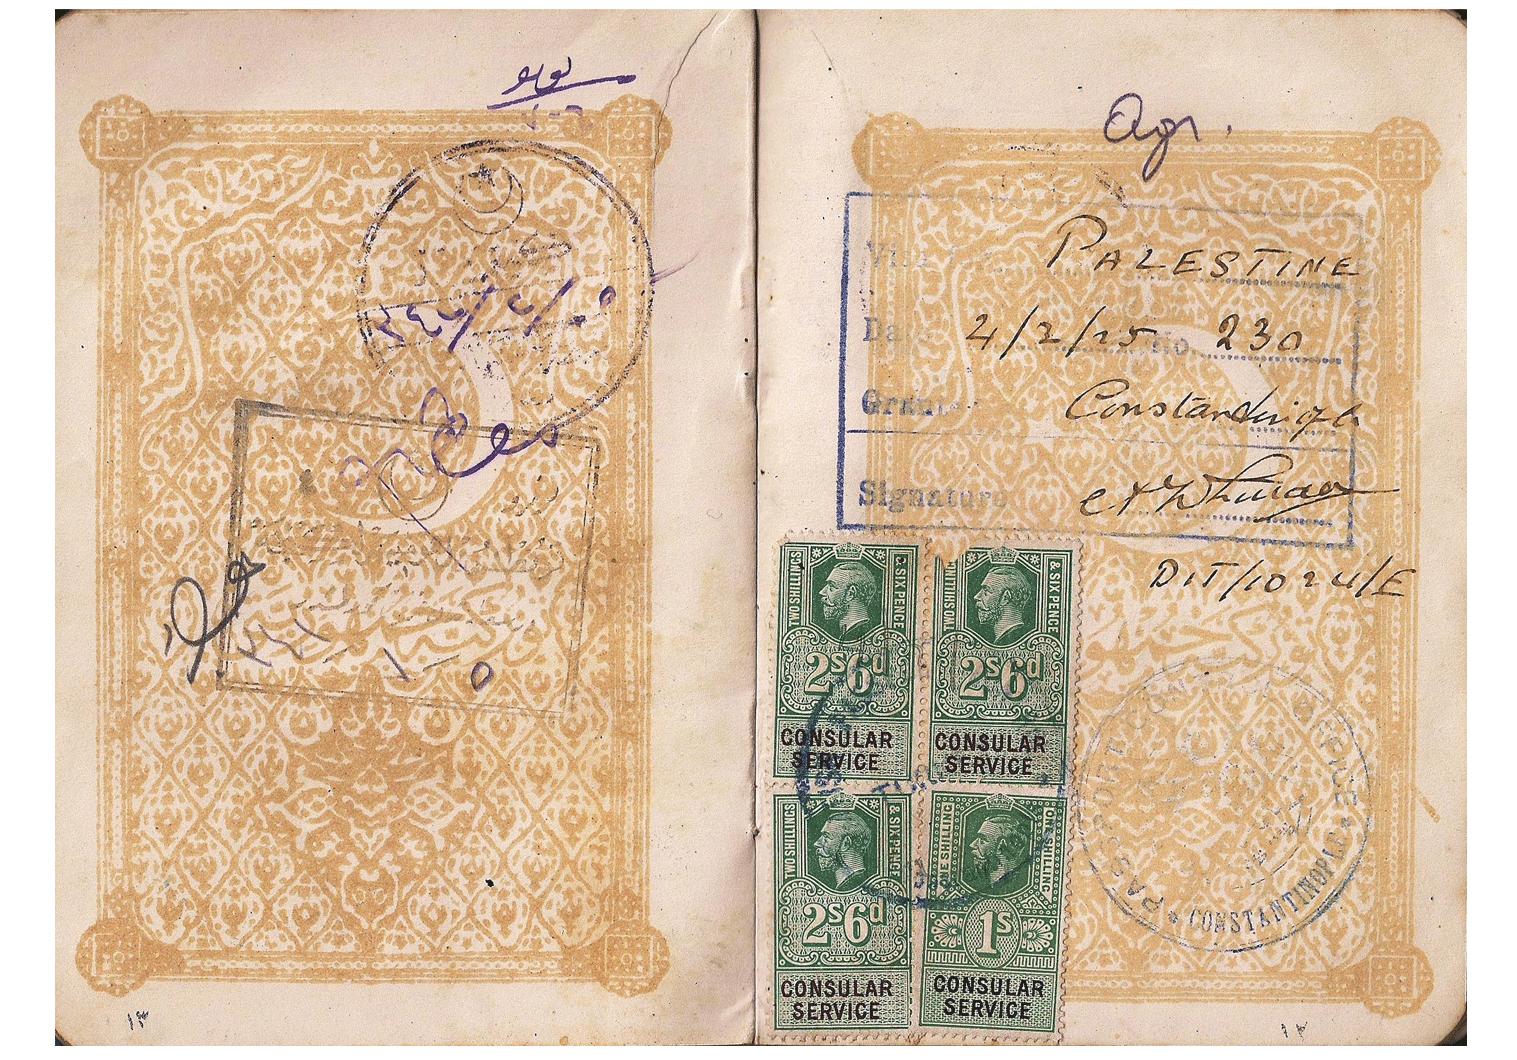 Arthur Whittall visa.